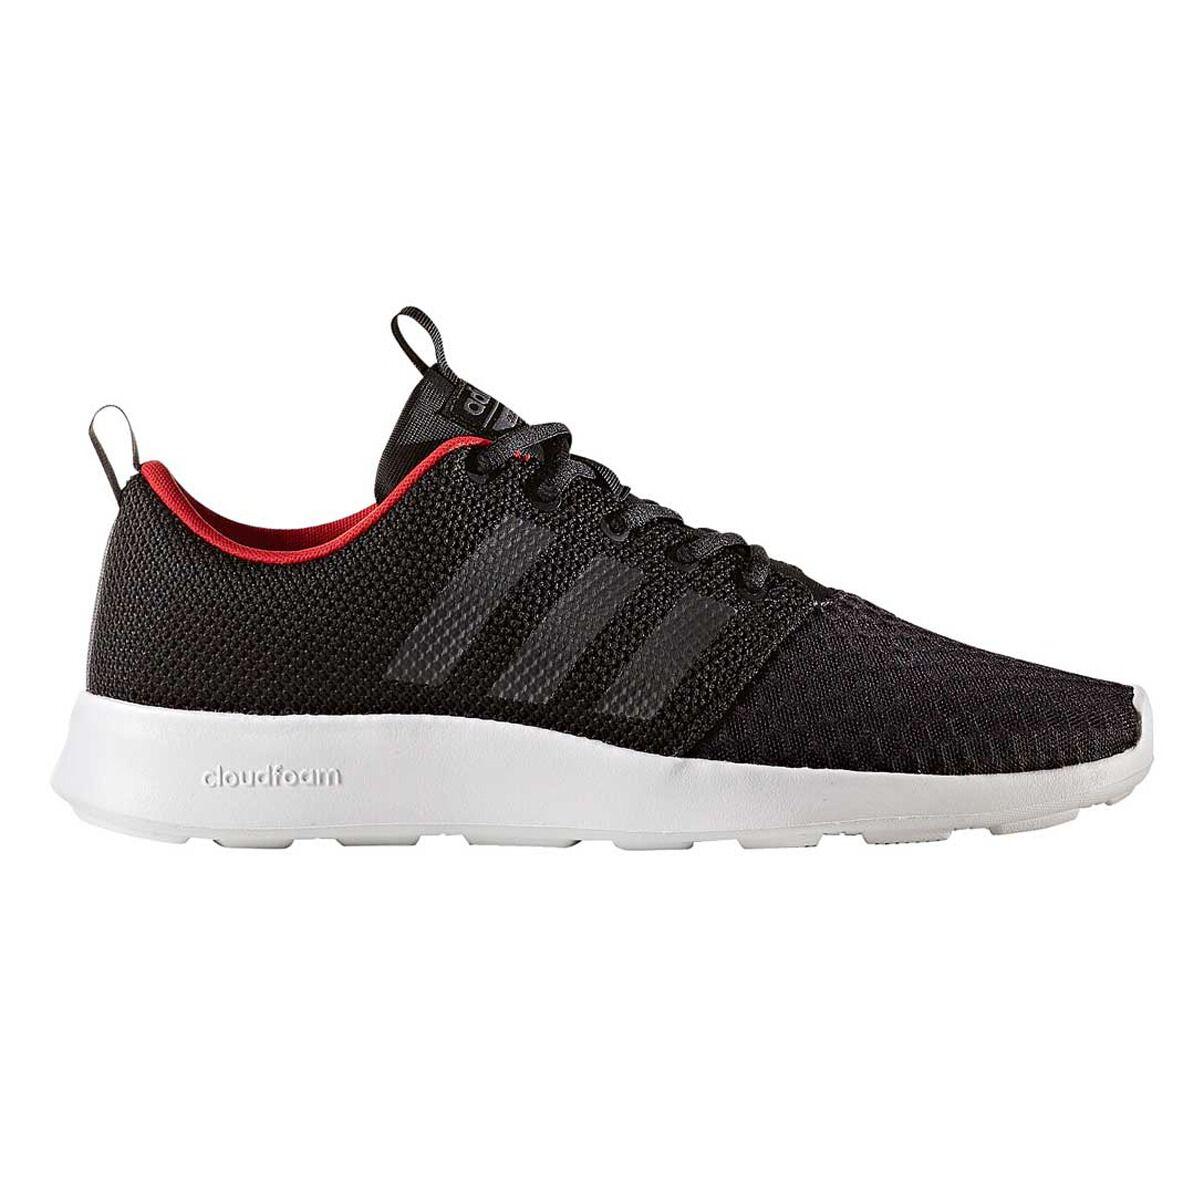 adidas cloudfoam swift racer mens casual scarpe nero / grigio noi 12